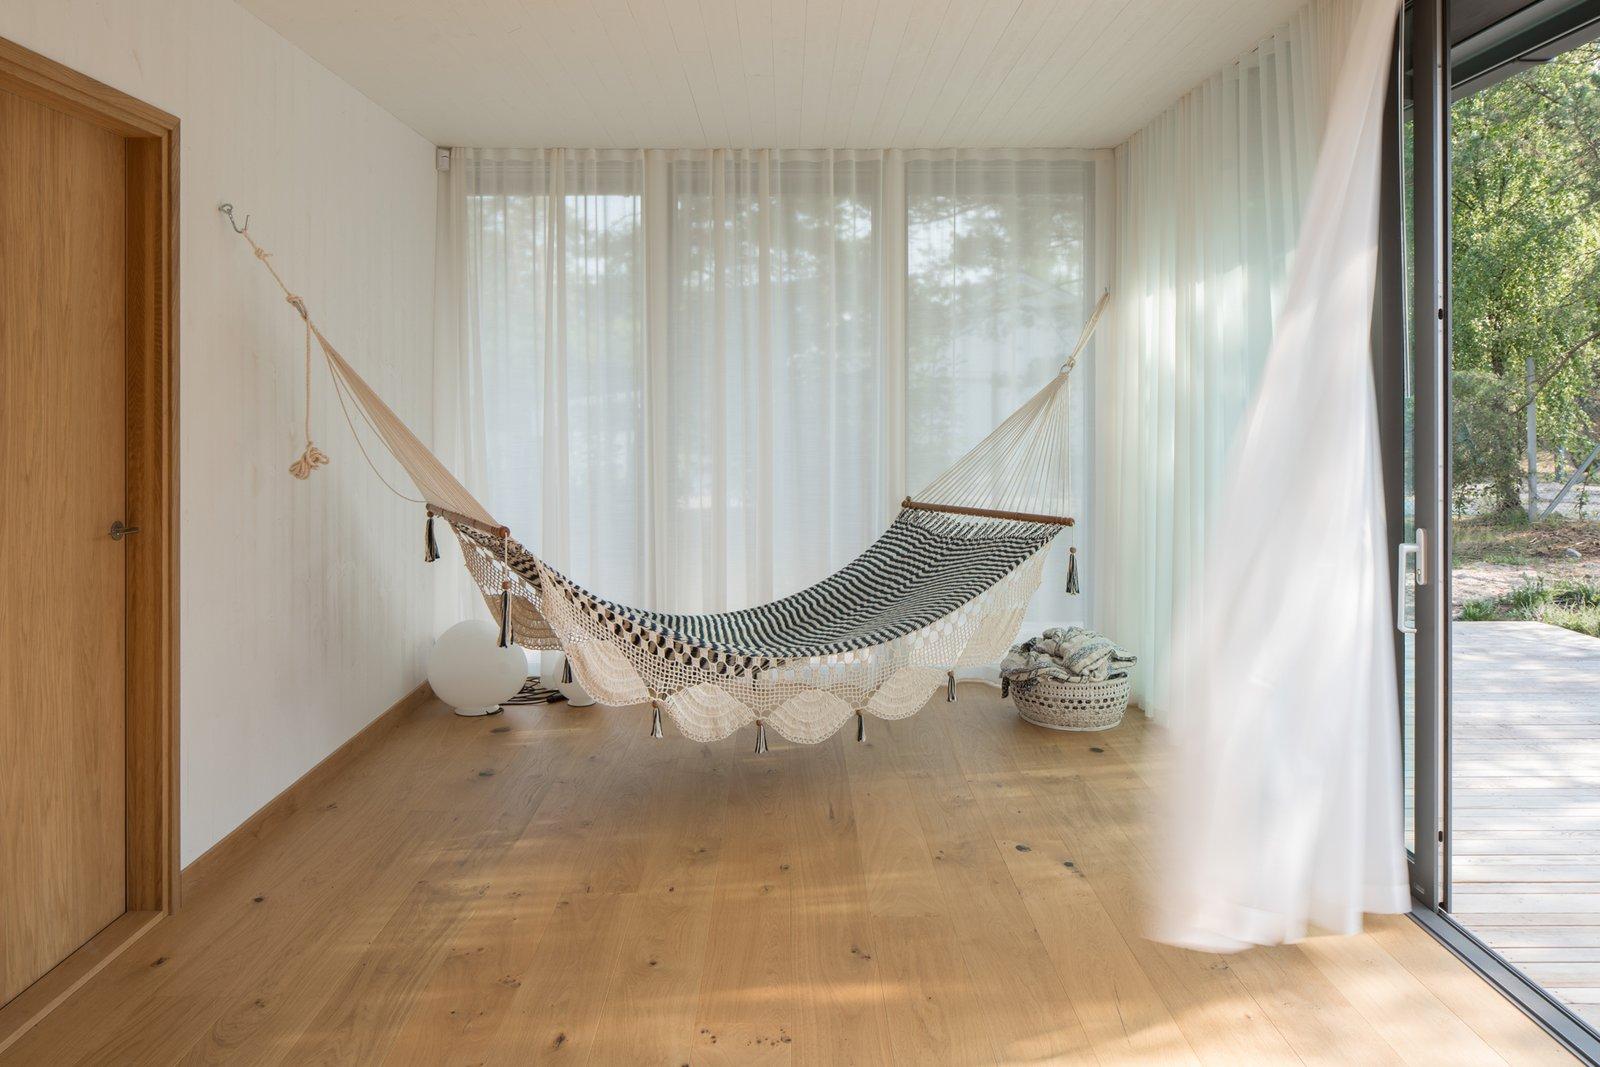 Johan Sundberg Summerhouse T lounge with hammock